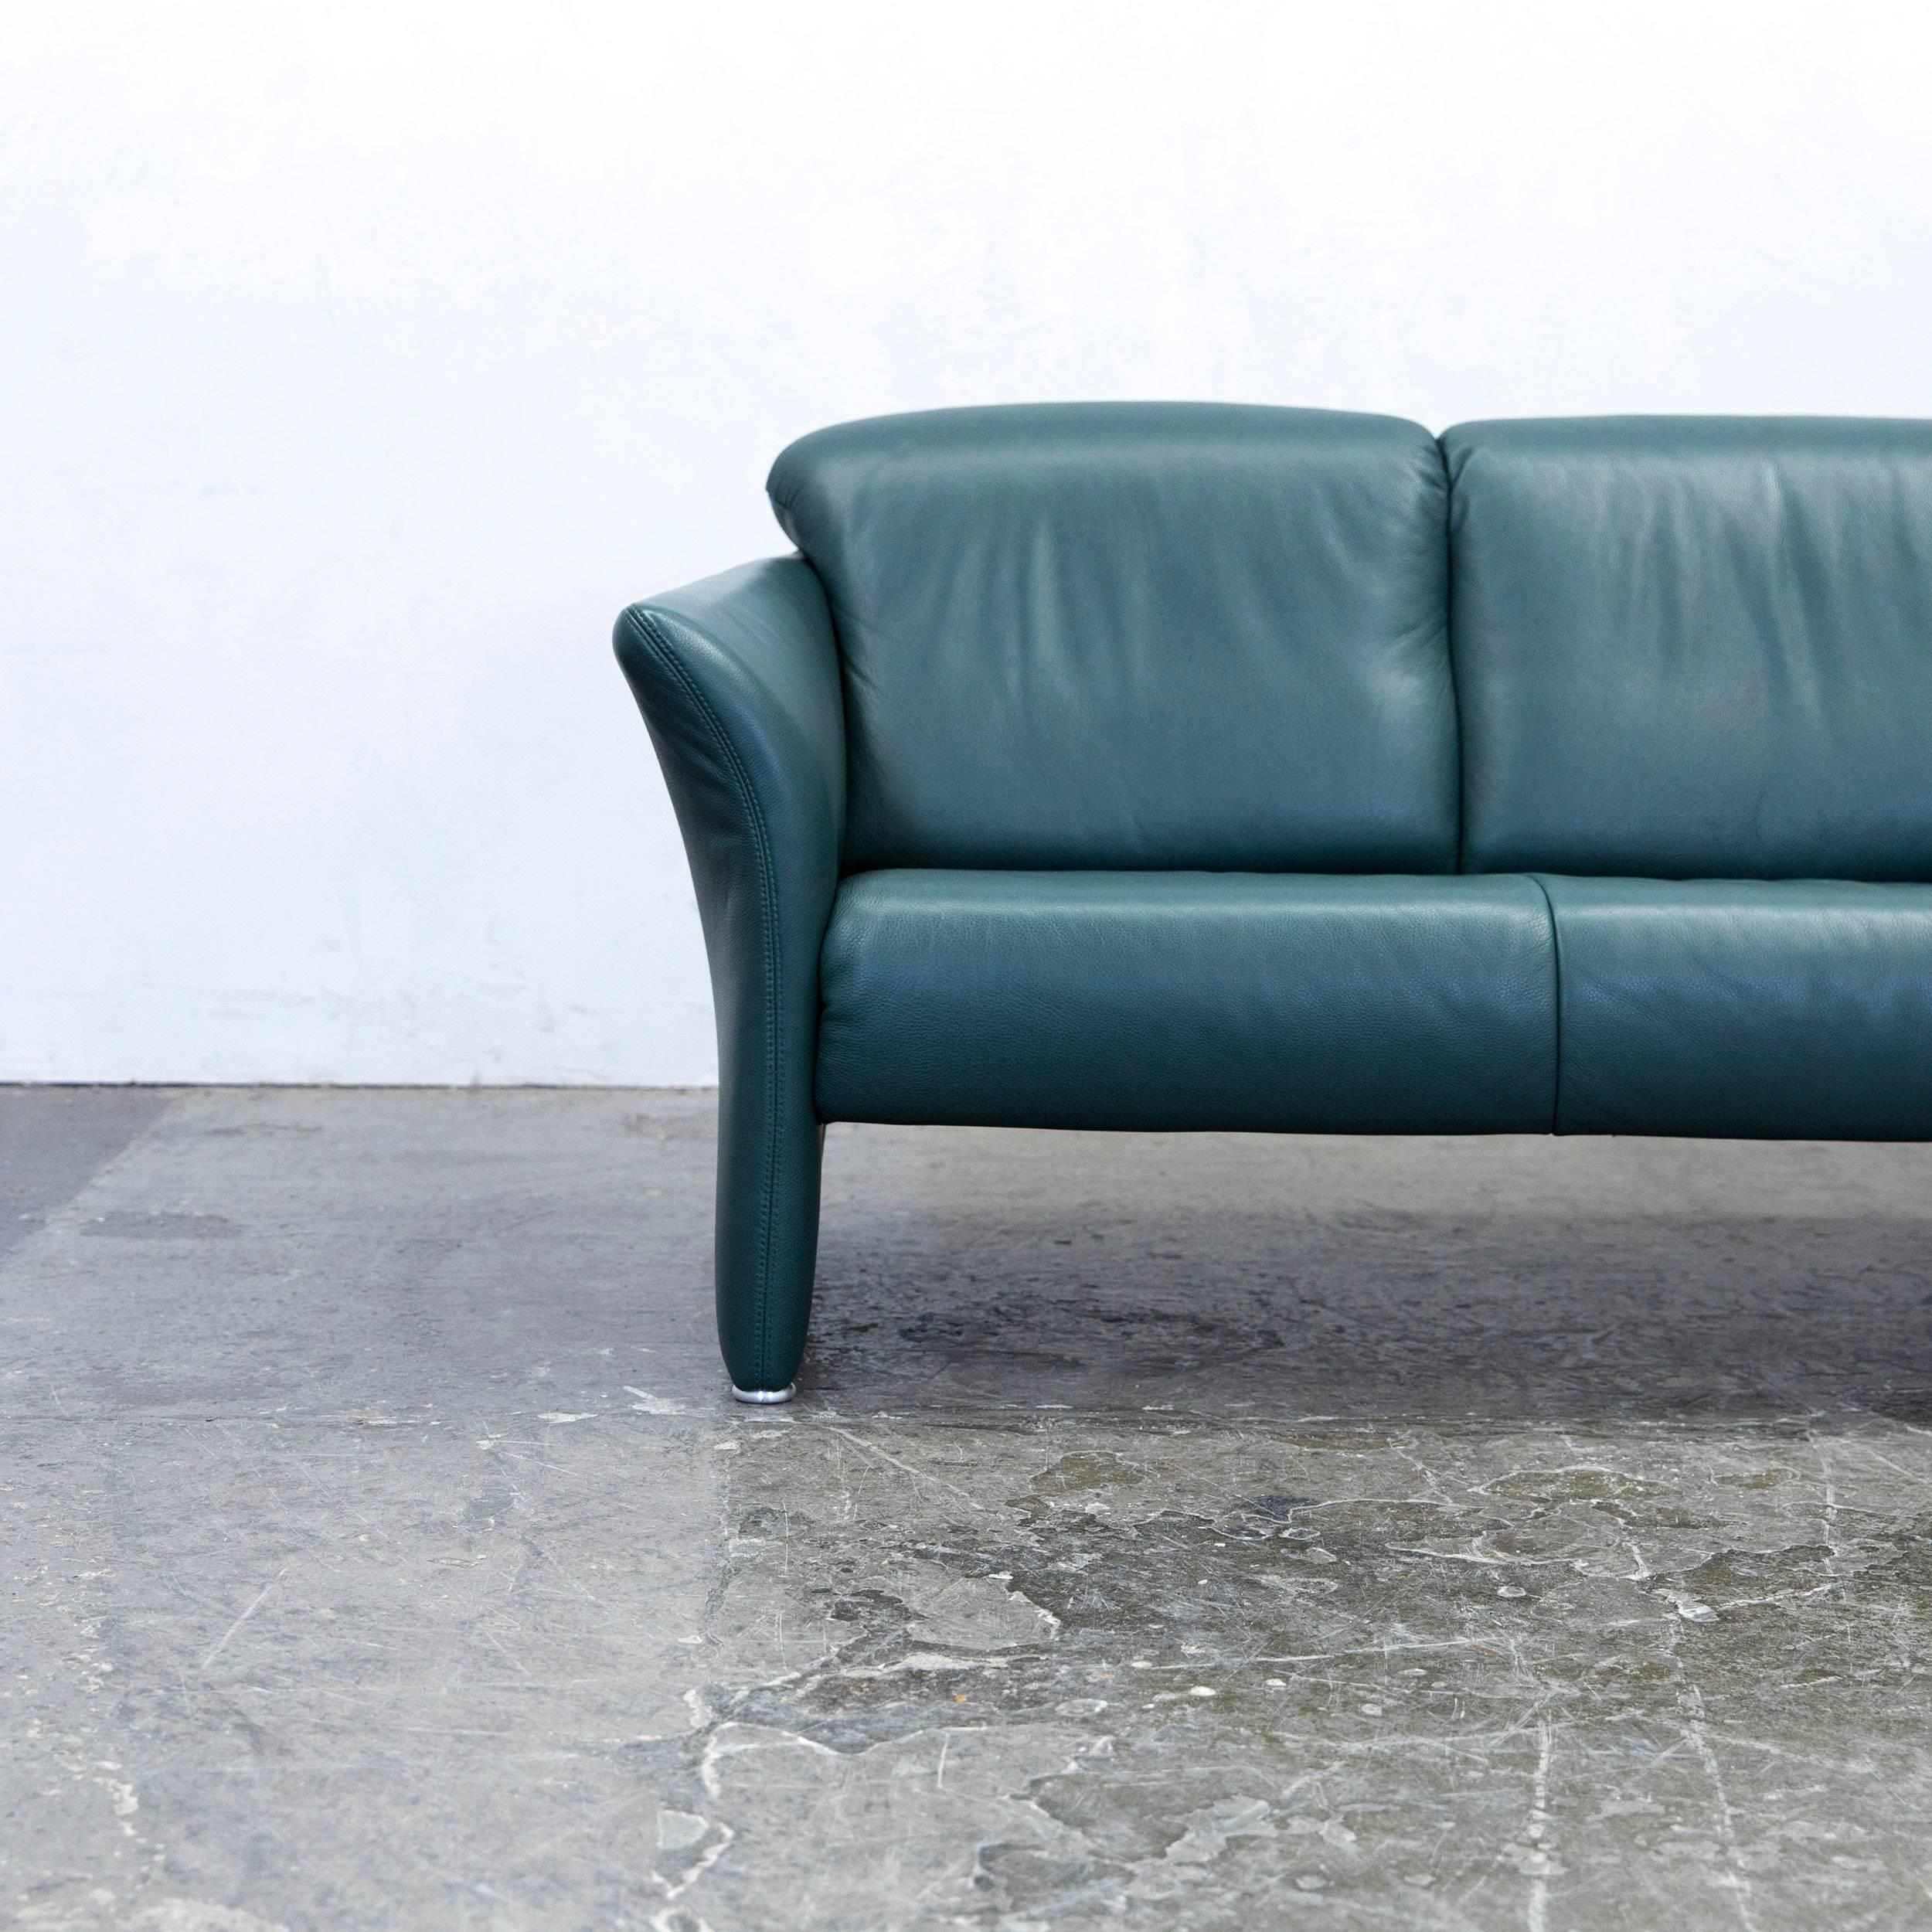 Green Colored Original Koinor Designer Leather Sofa, In A Minimalistic And  Modern Design, Made